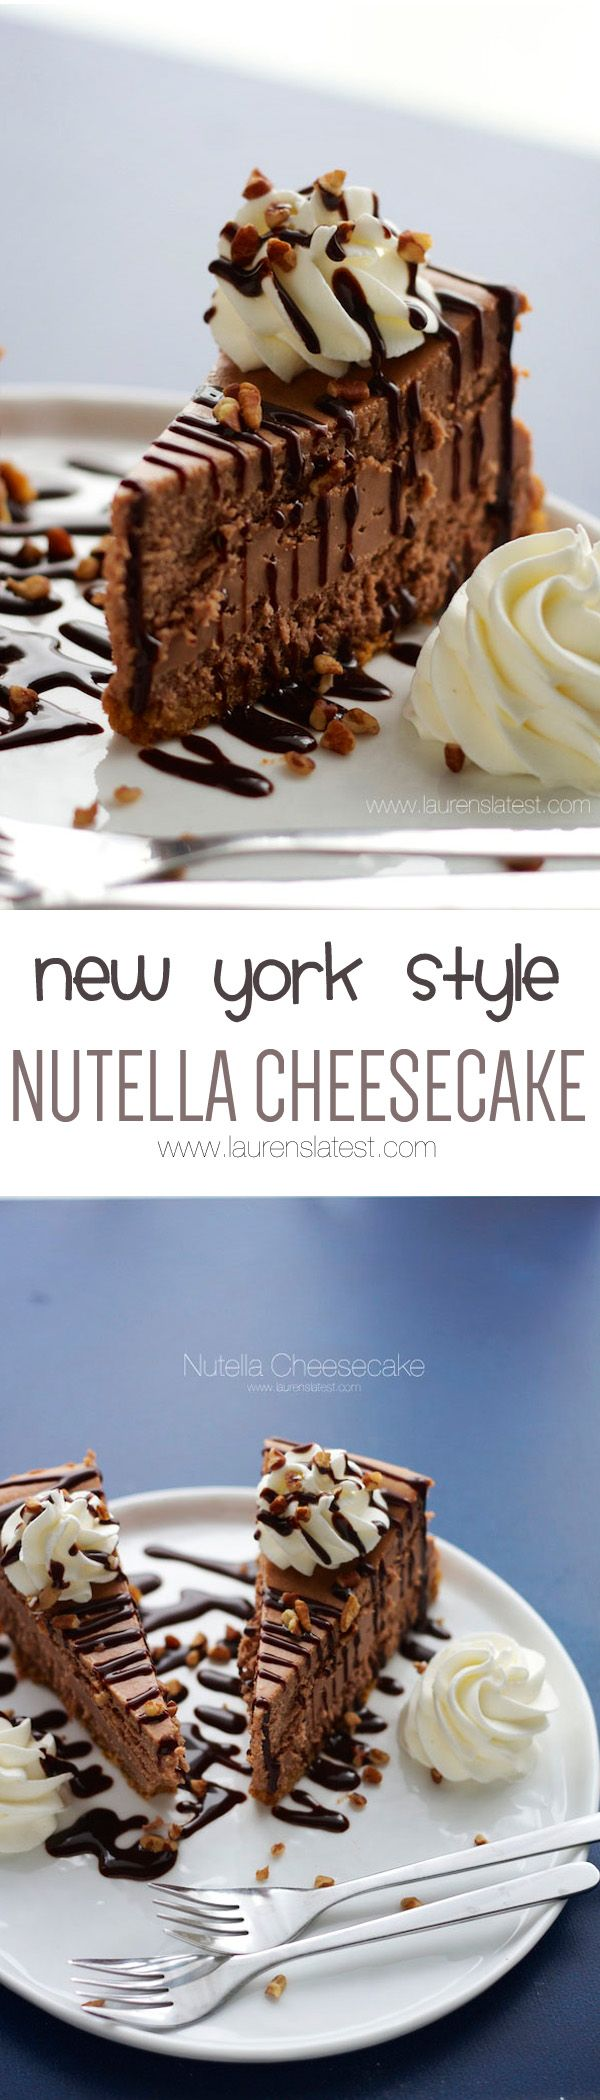 New York Style Nutella Cheesecake